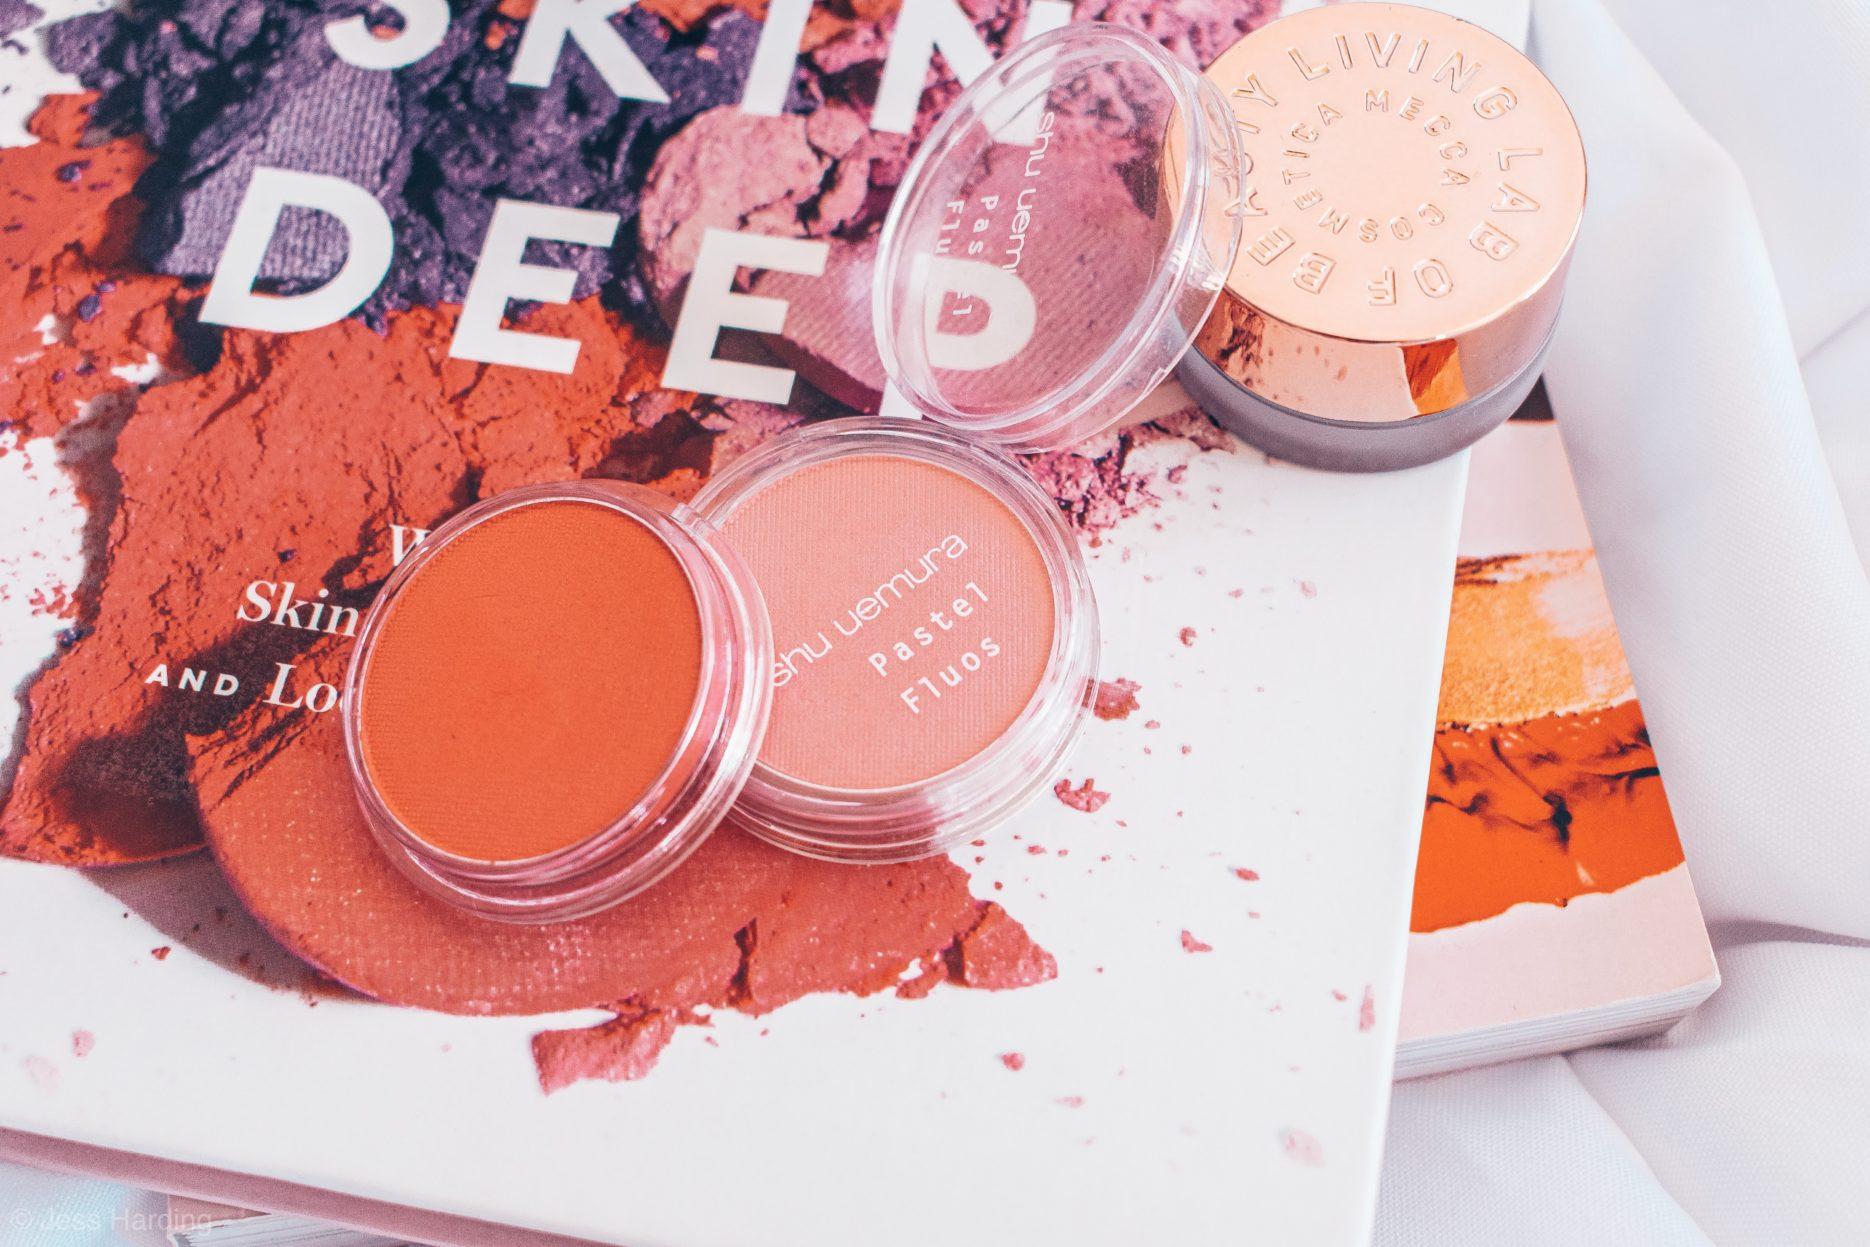 Beauty brands on Tmall. Credit: Unsplash